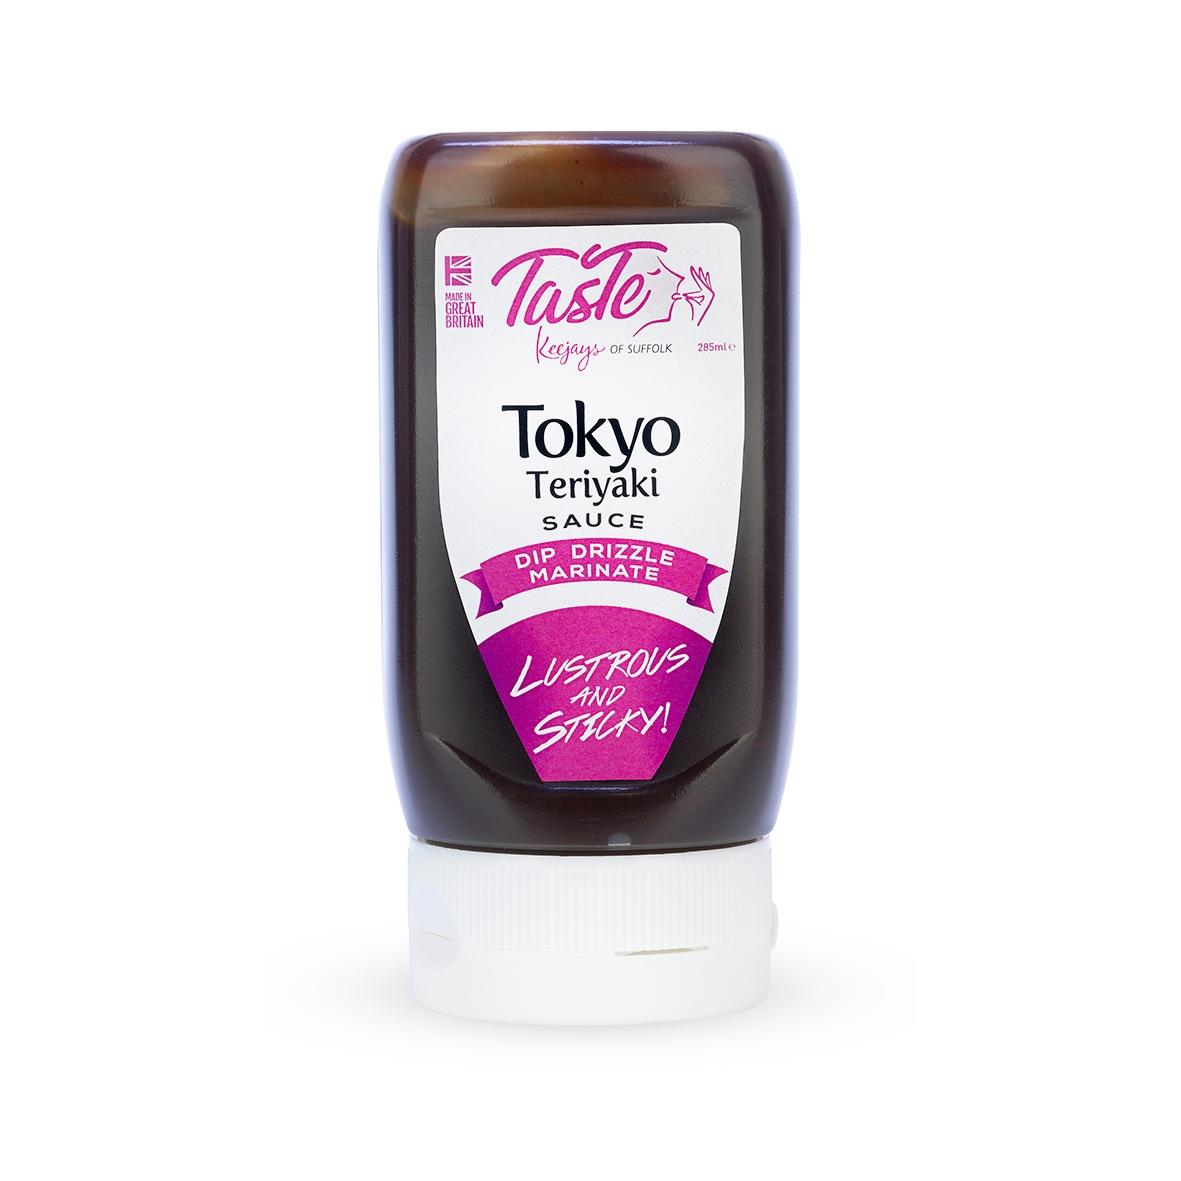 Taste Keejays Of Suffolk Tokyo Teriyaki Condiment Sauce Wholesale Pack